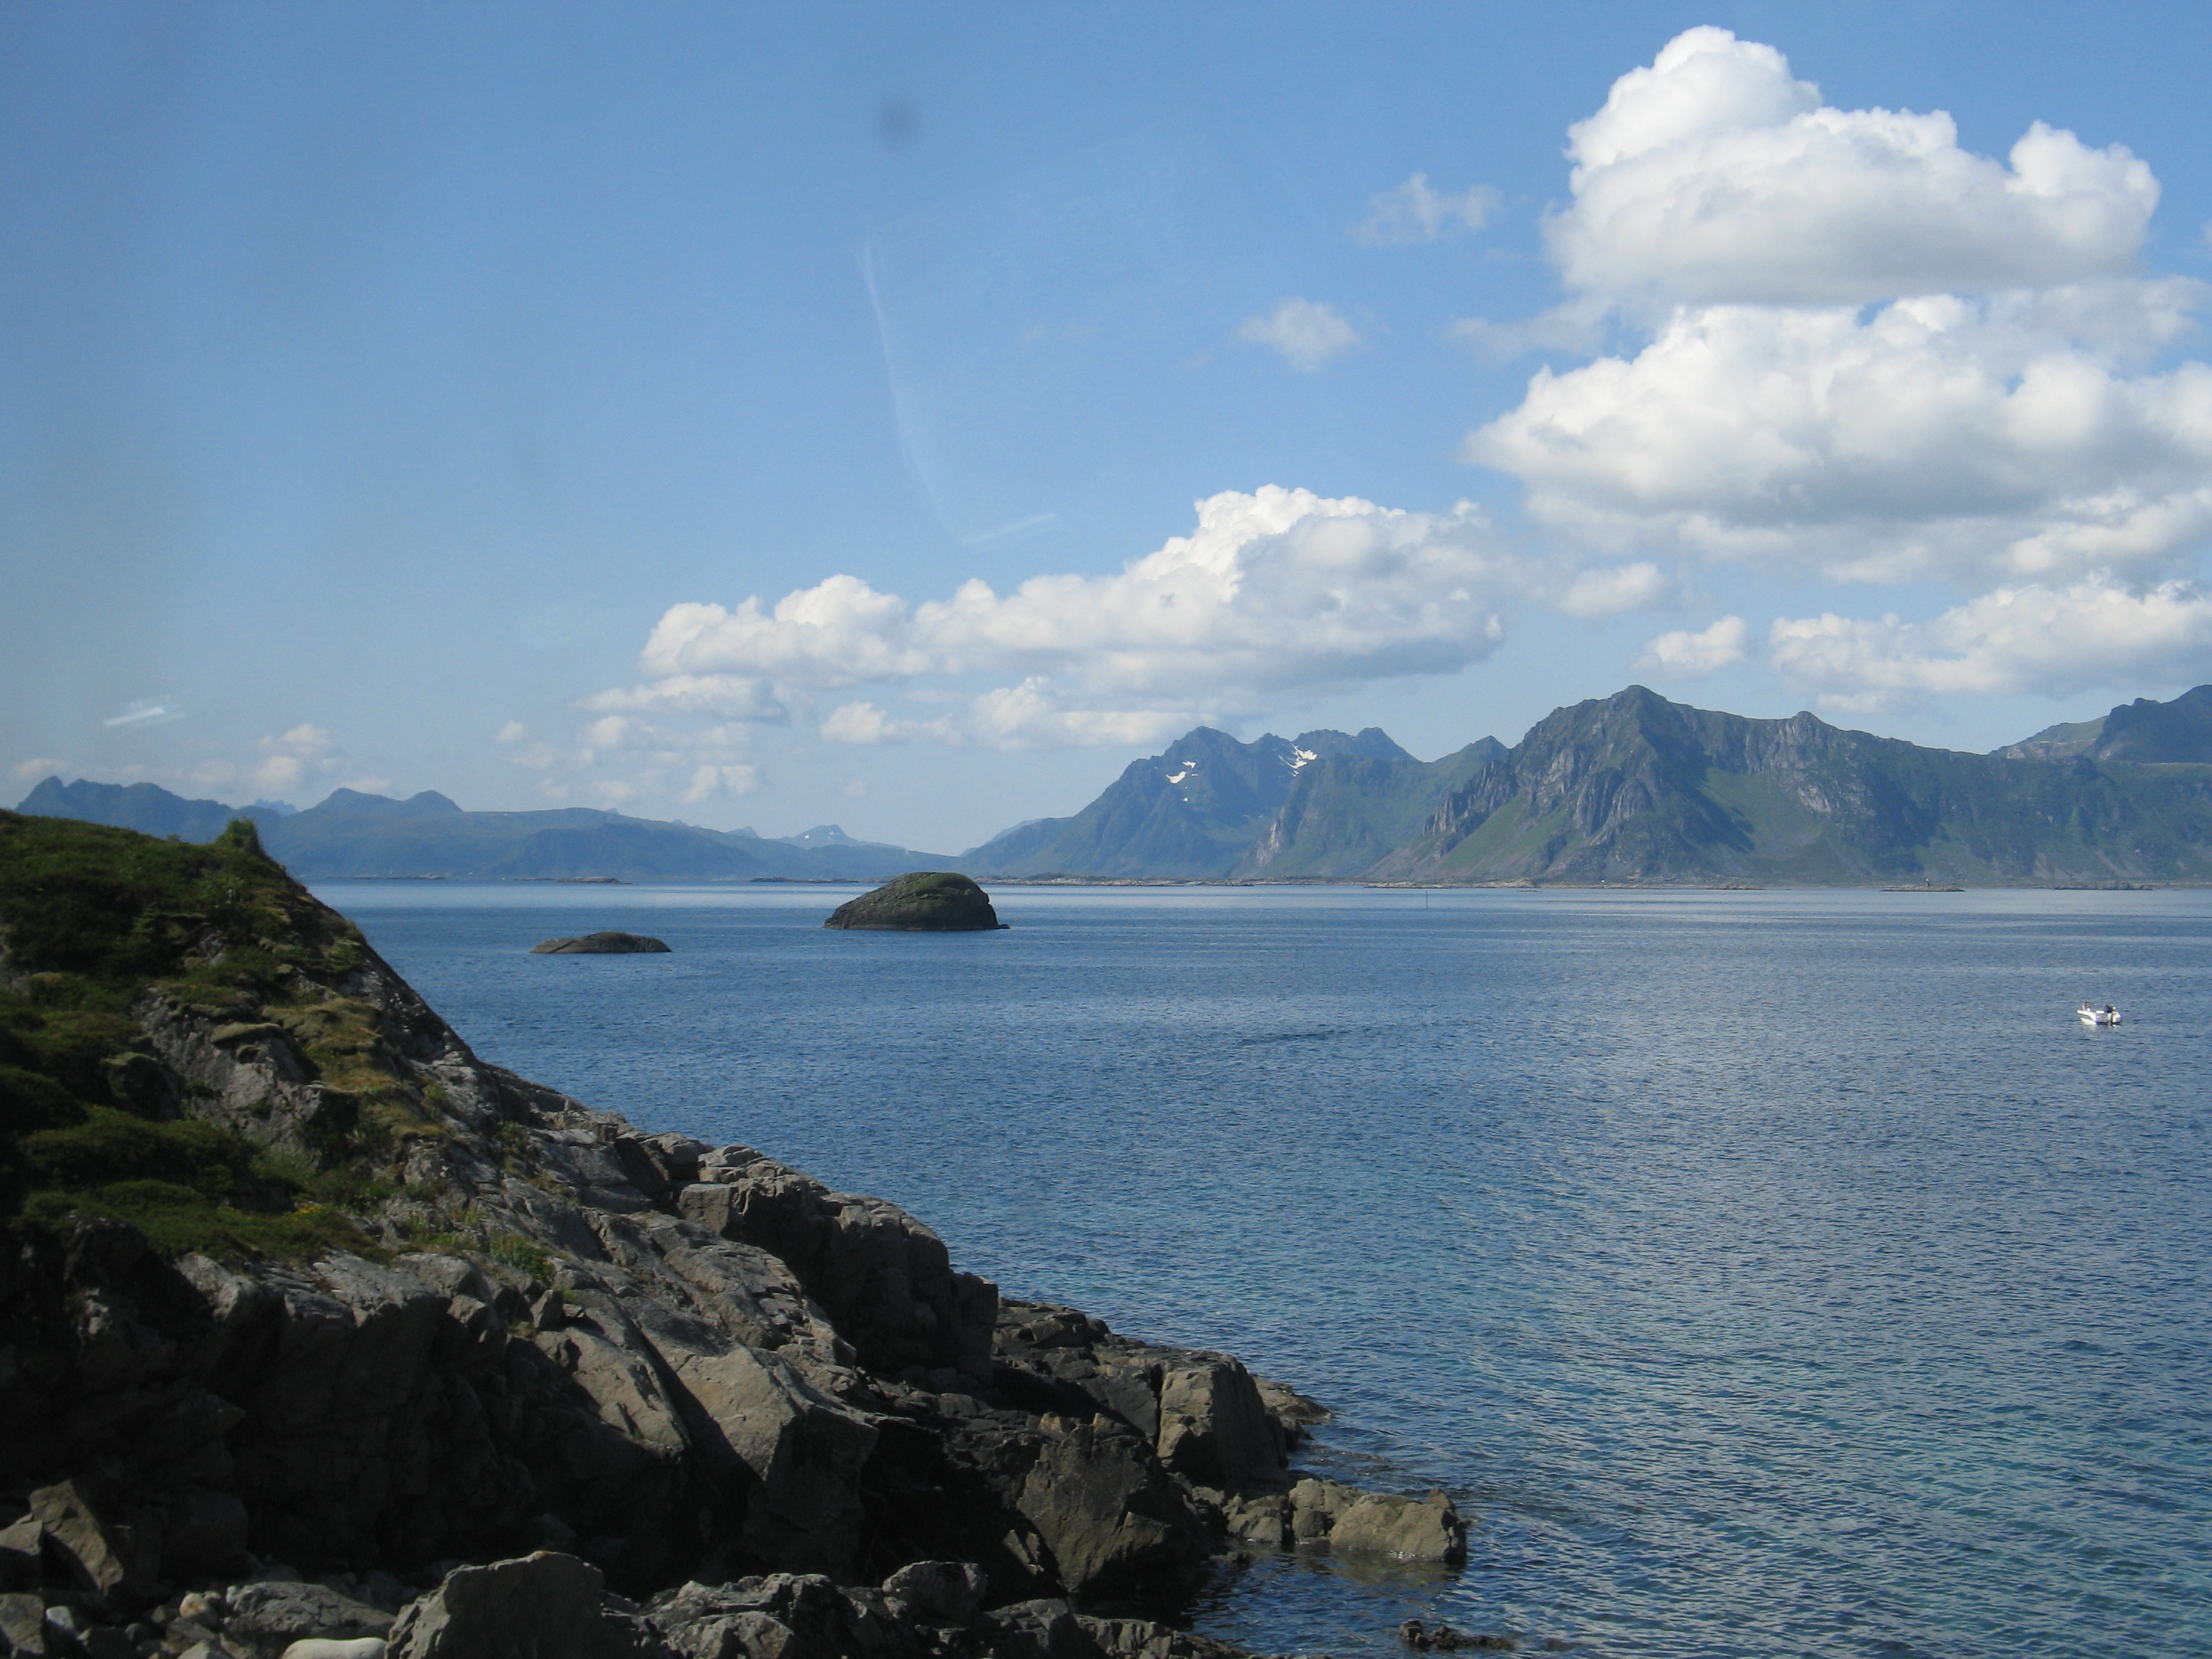 Isole Lofoten (Norvegia)